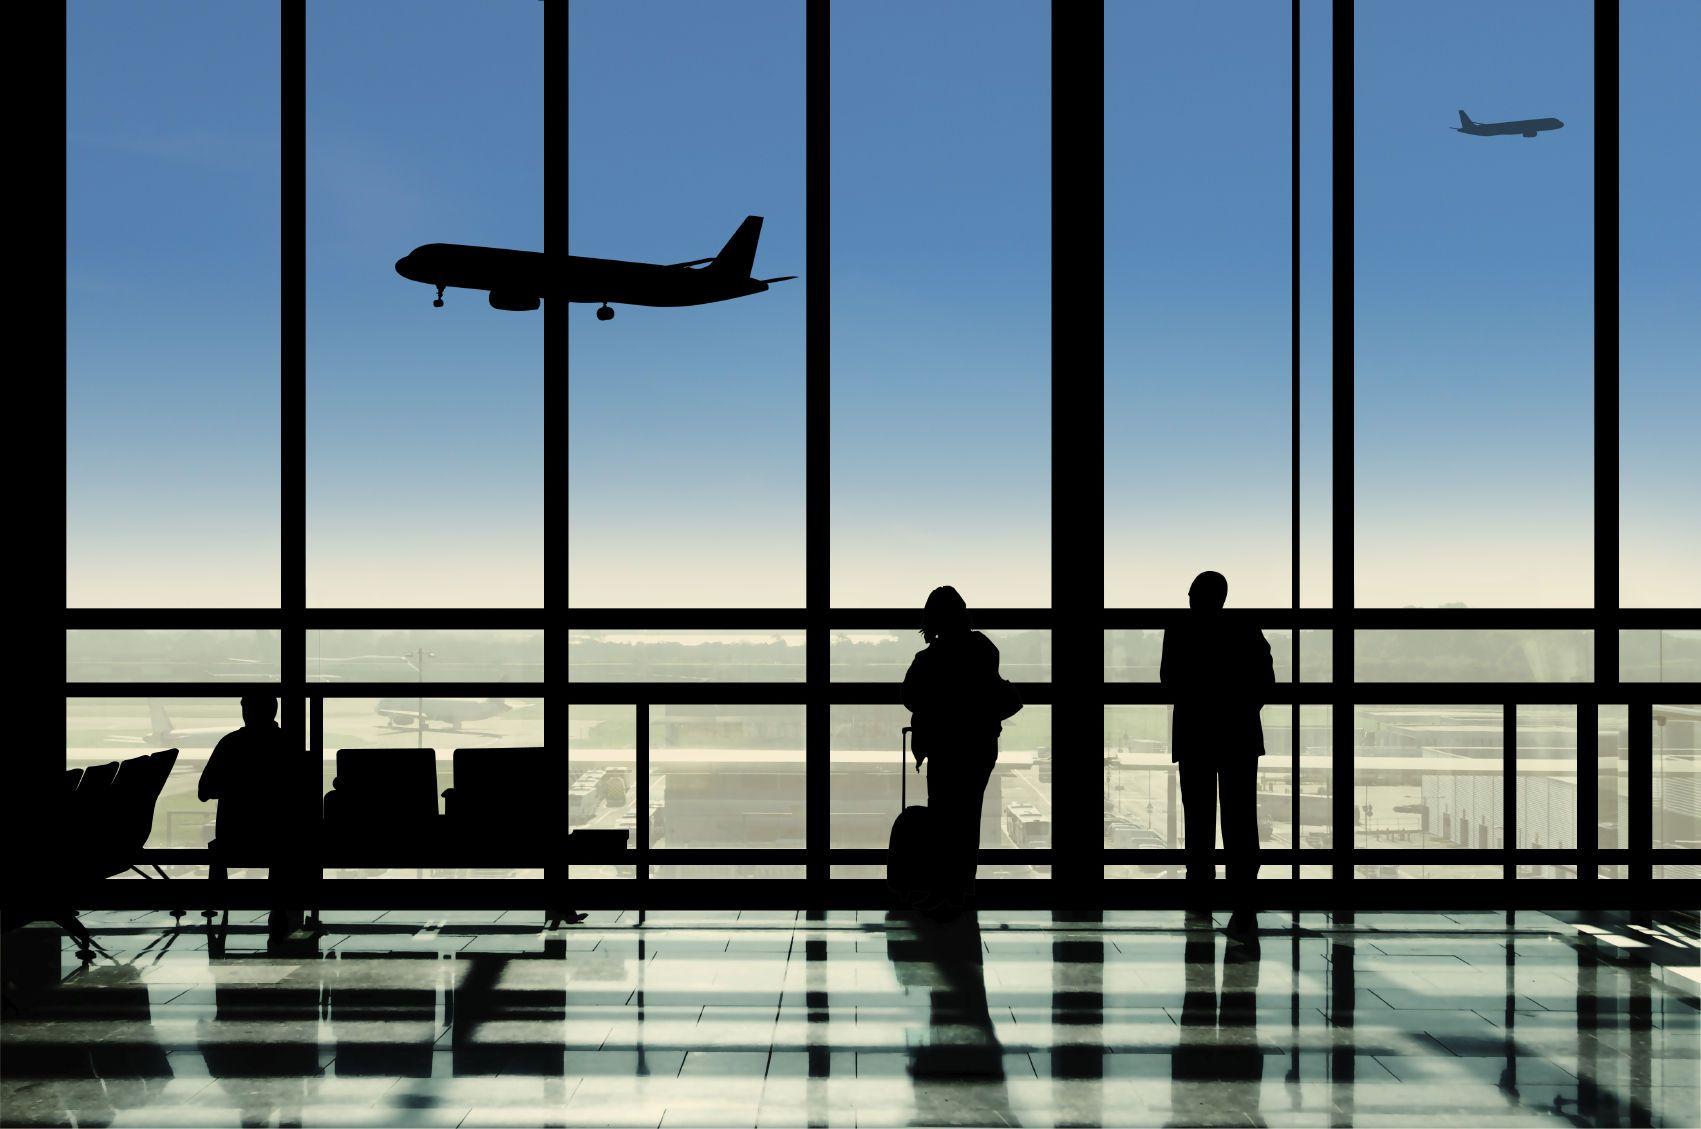 пассажир аэропорт